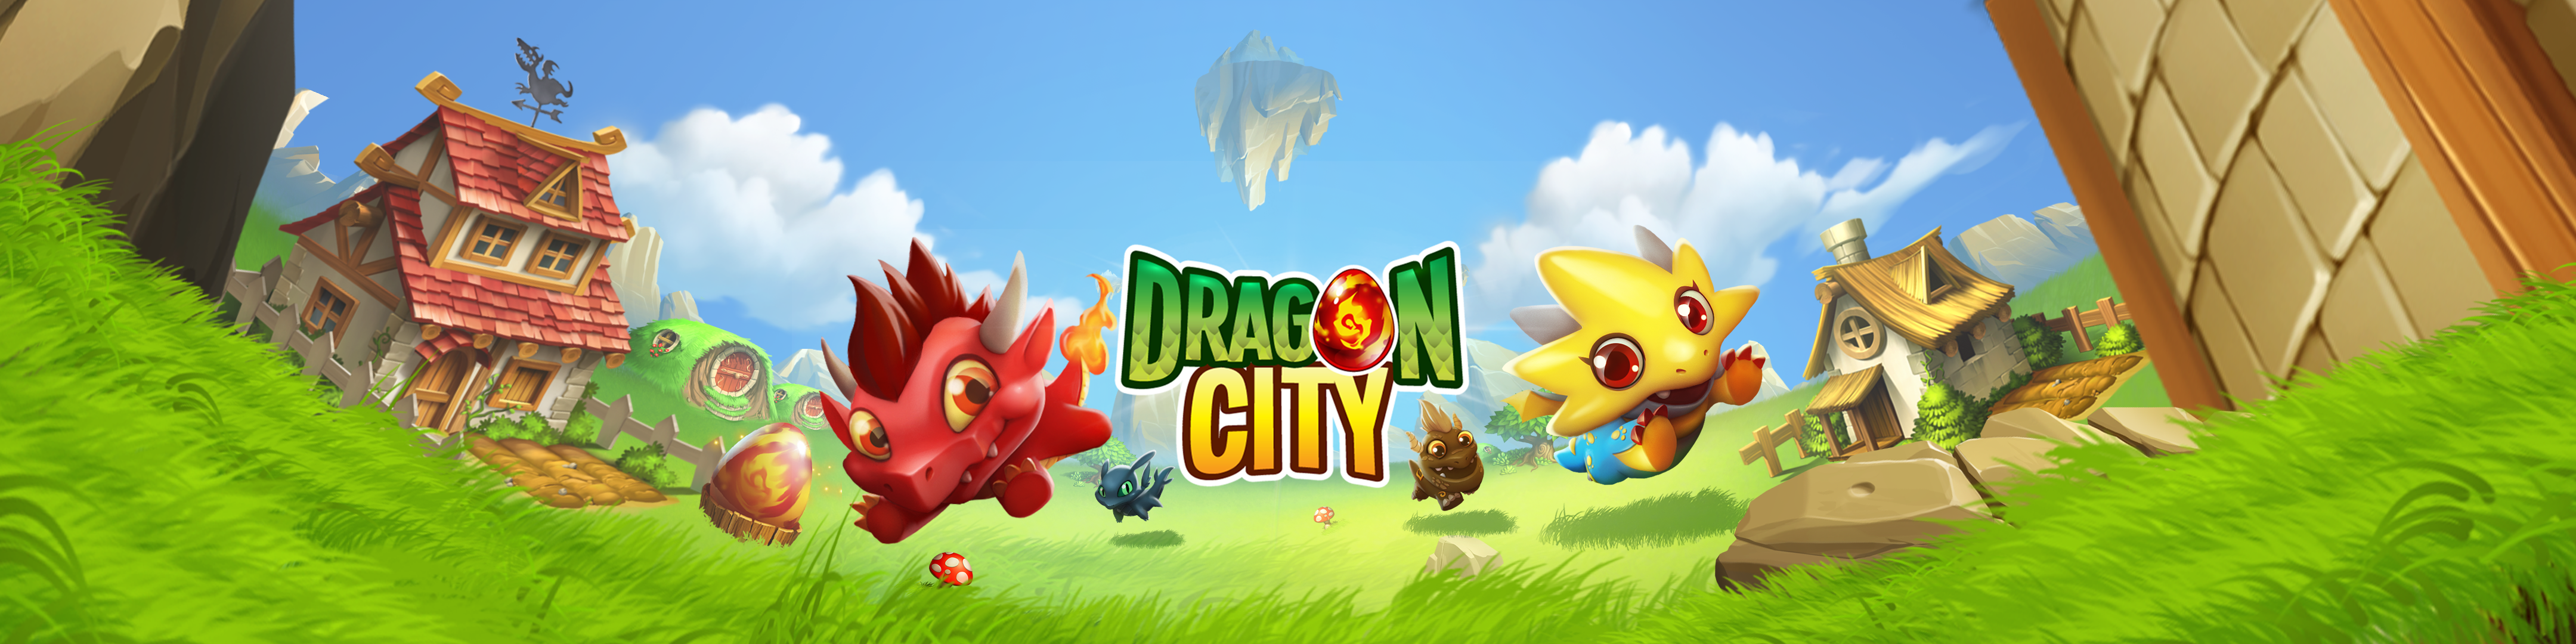 app dragon city download